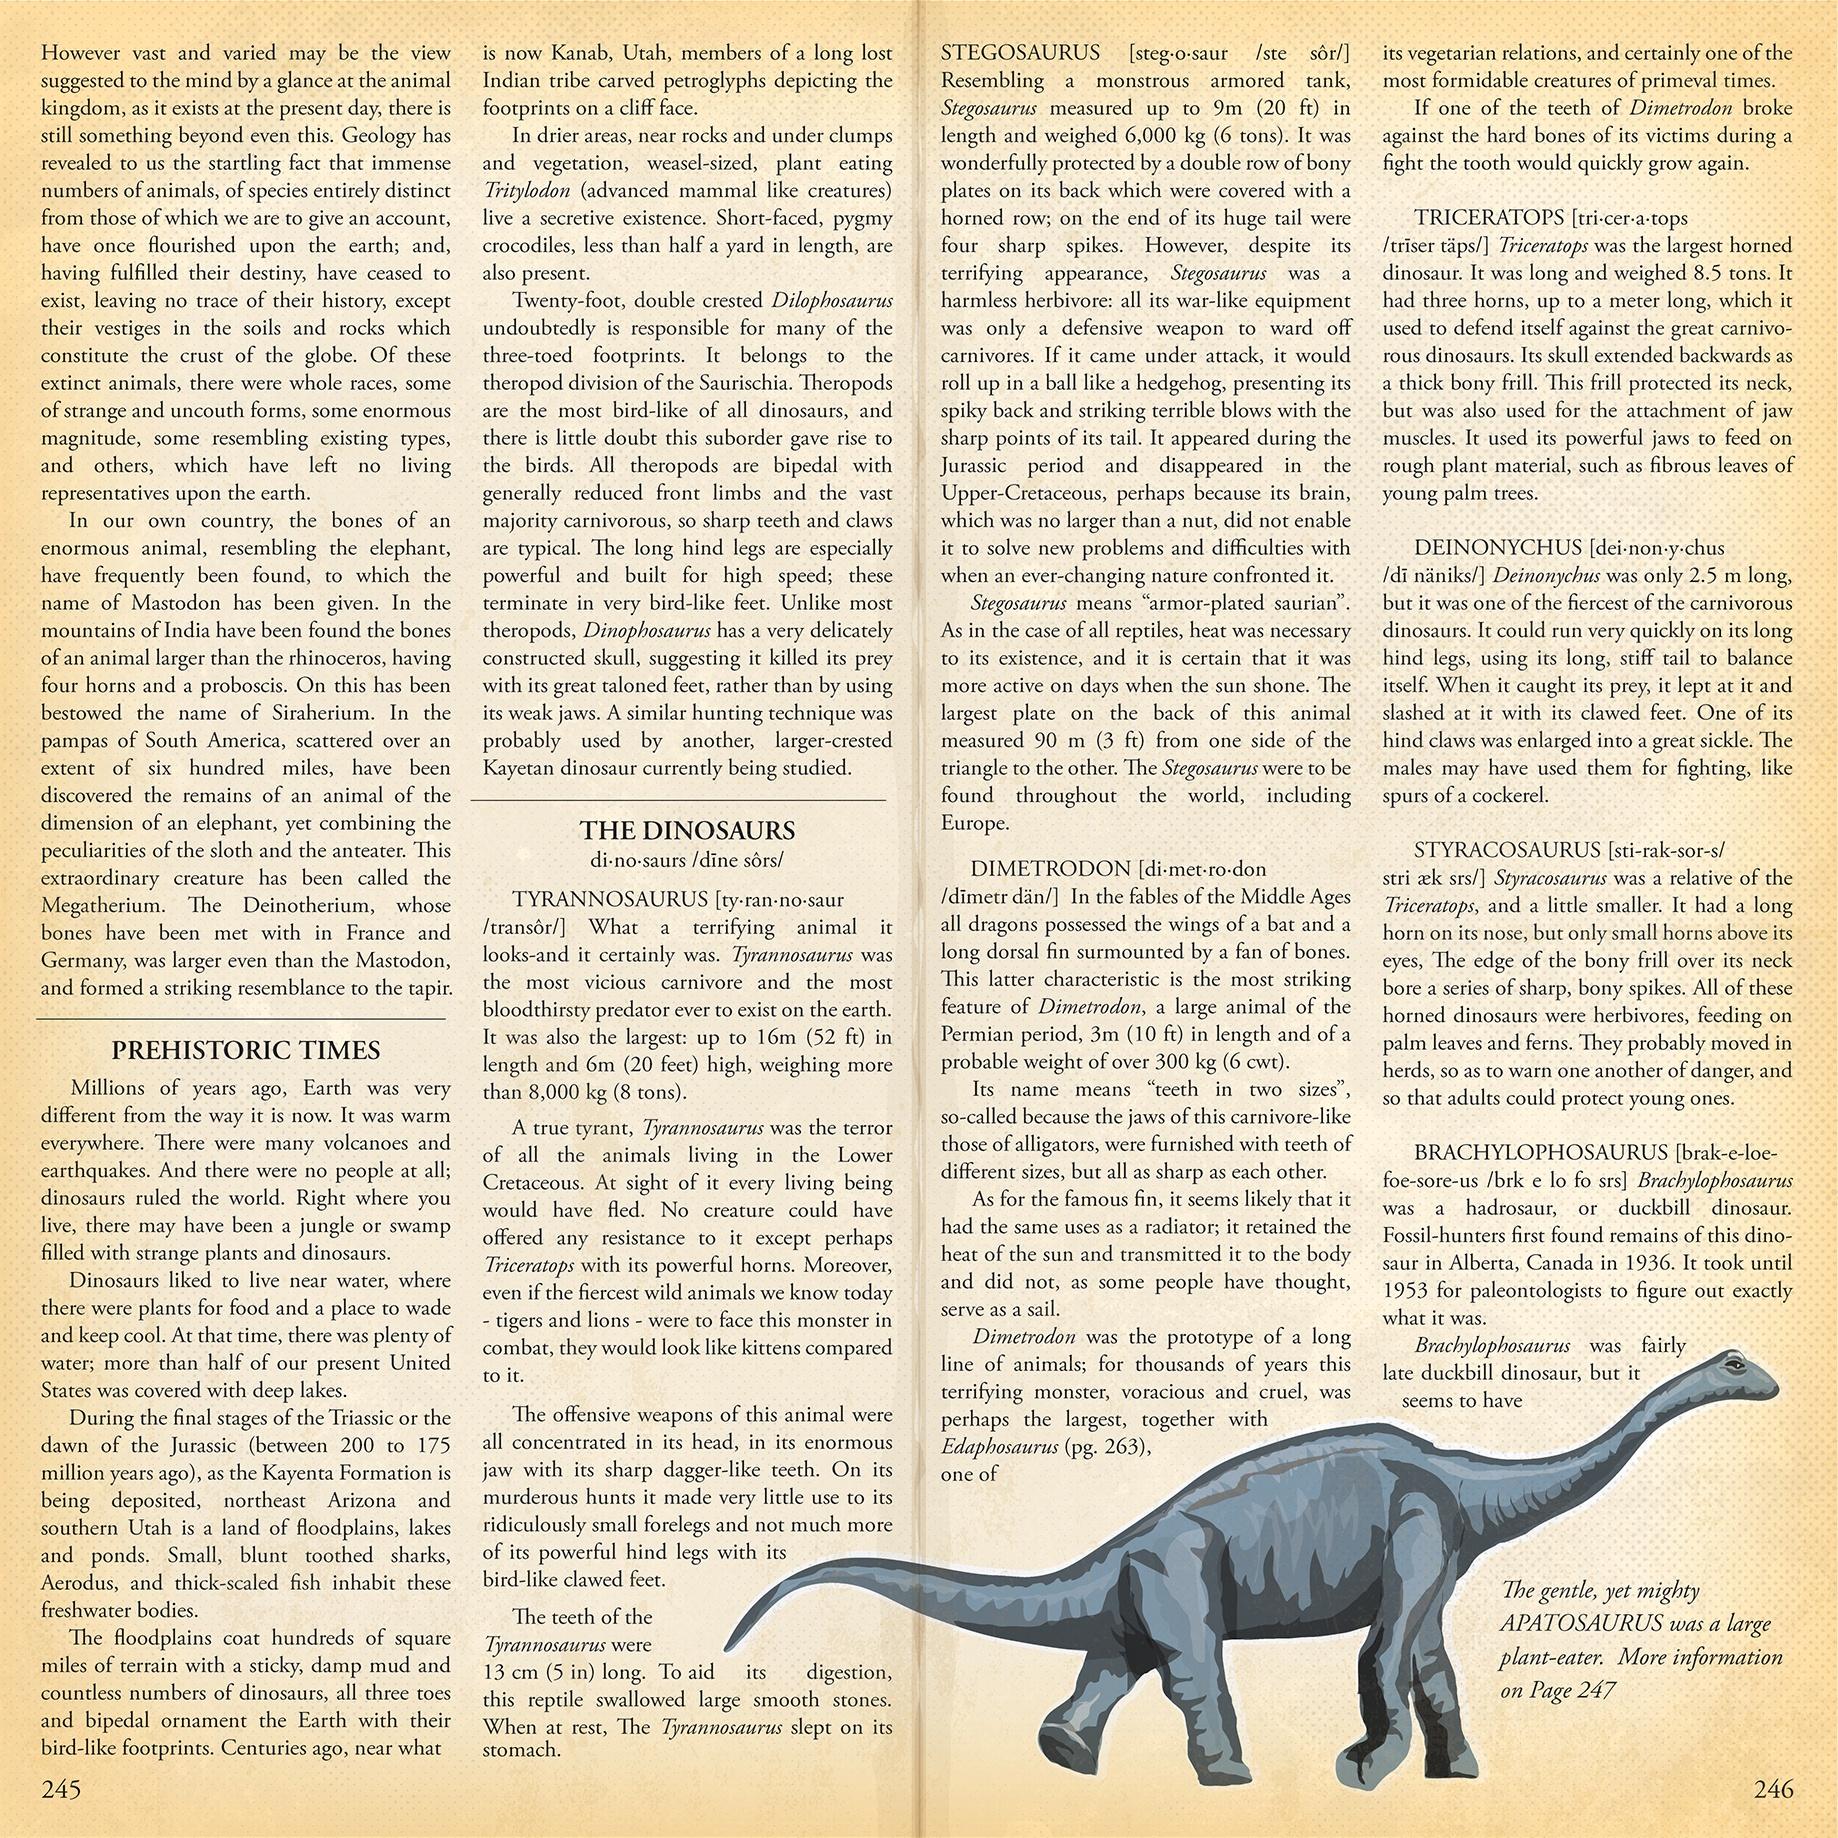 Dinosaurs - 4x6 Journaling Cards